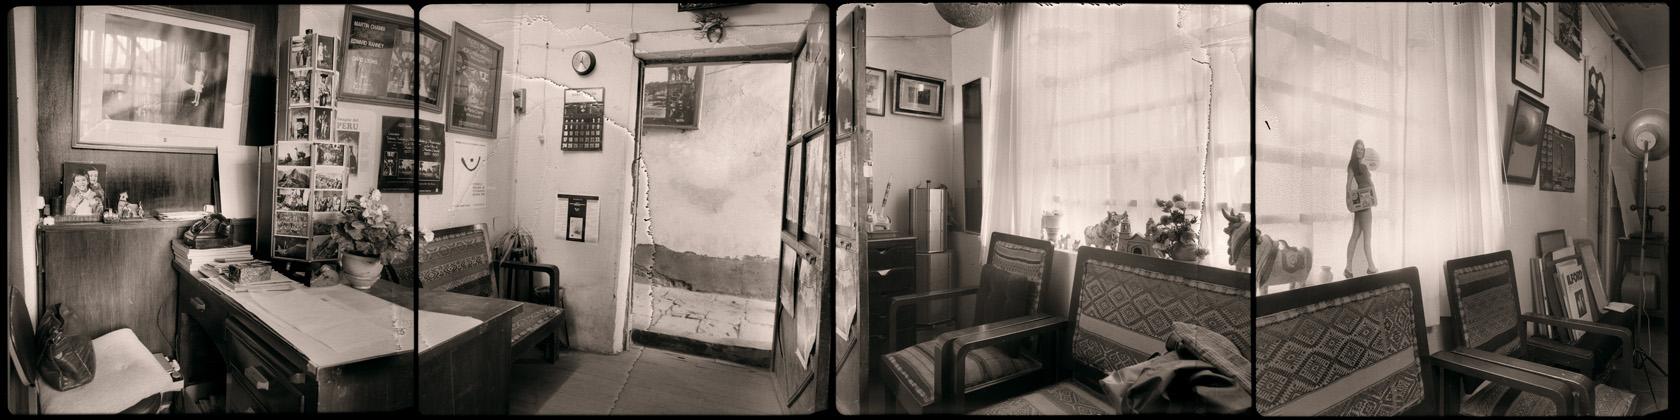 Estudio de Julia Chambi<br/>Virado de oro / Golden Toner